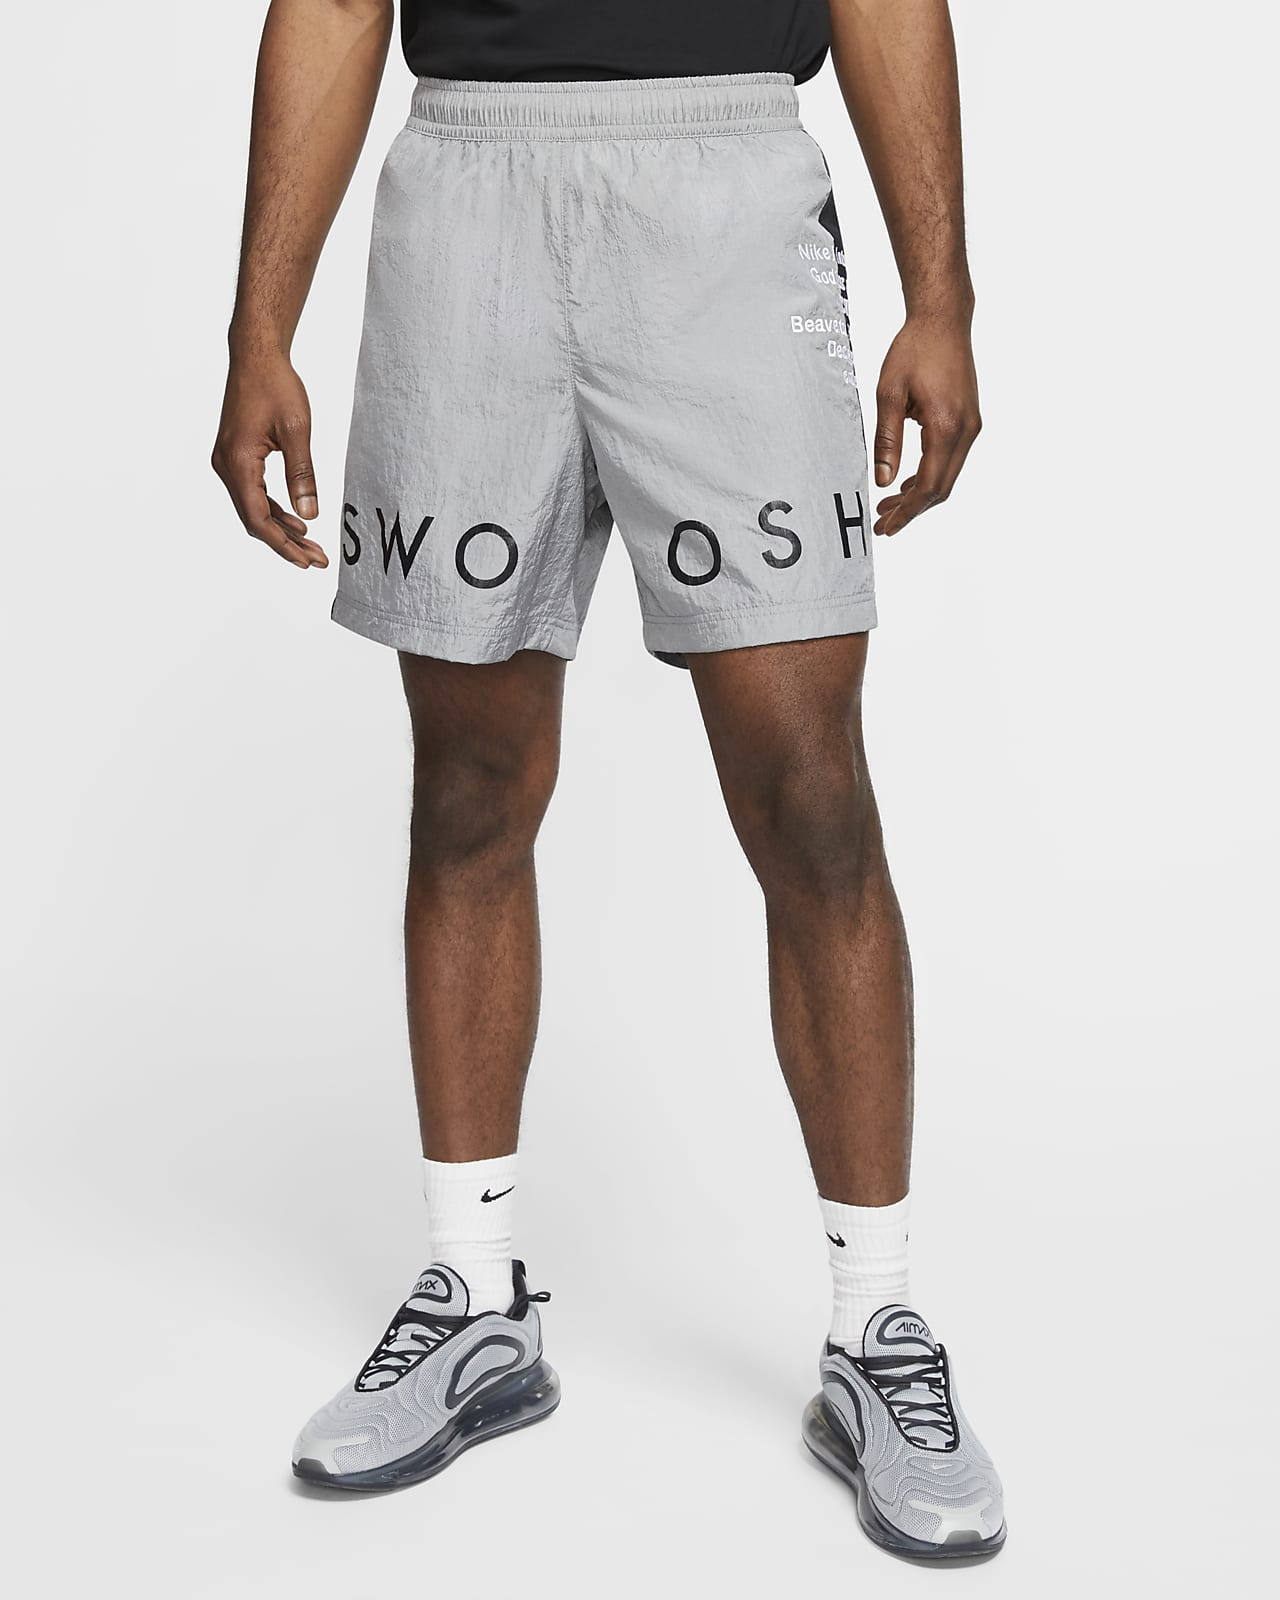 Nike Cortez : Women's Clothing Mens Shorts Stores,Mens T